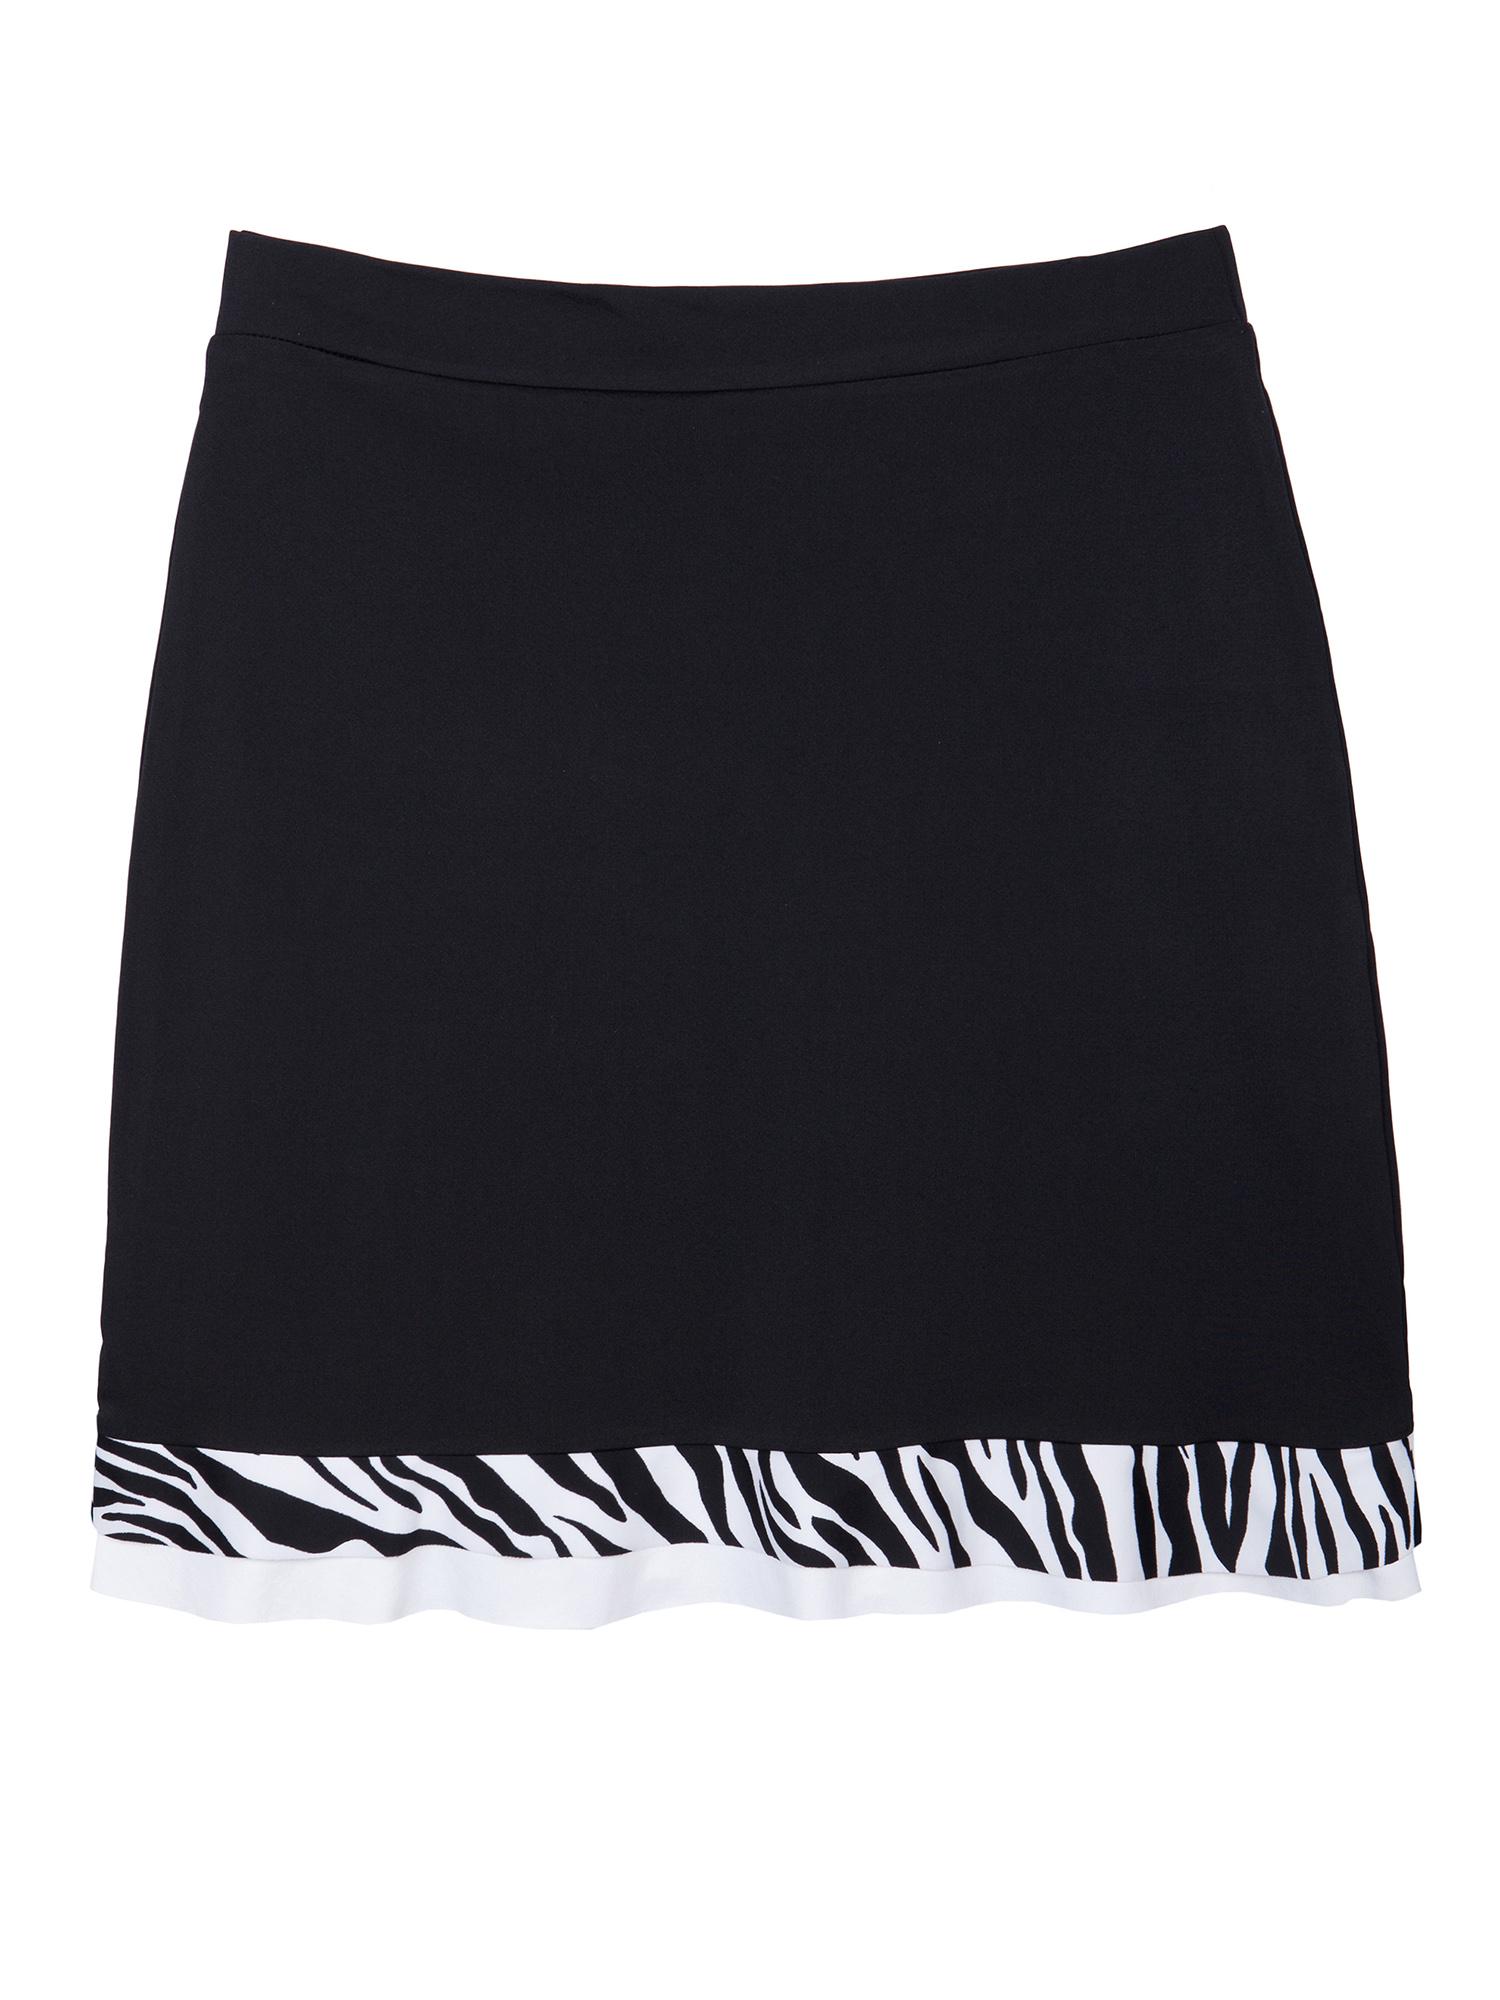 Modest swim and sport skirts